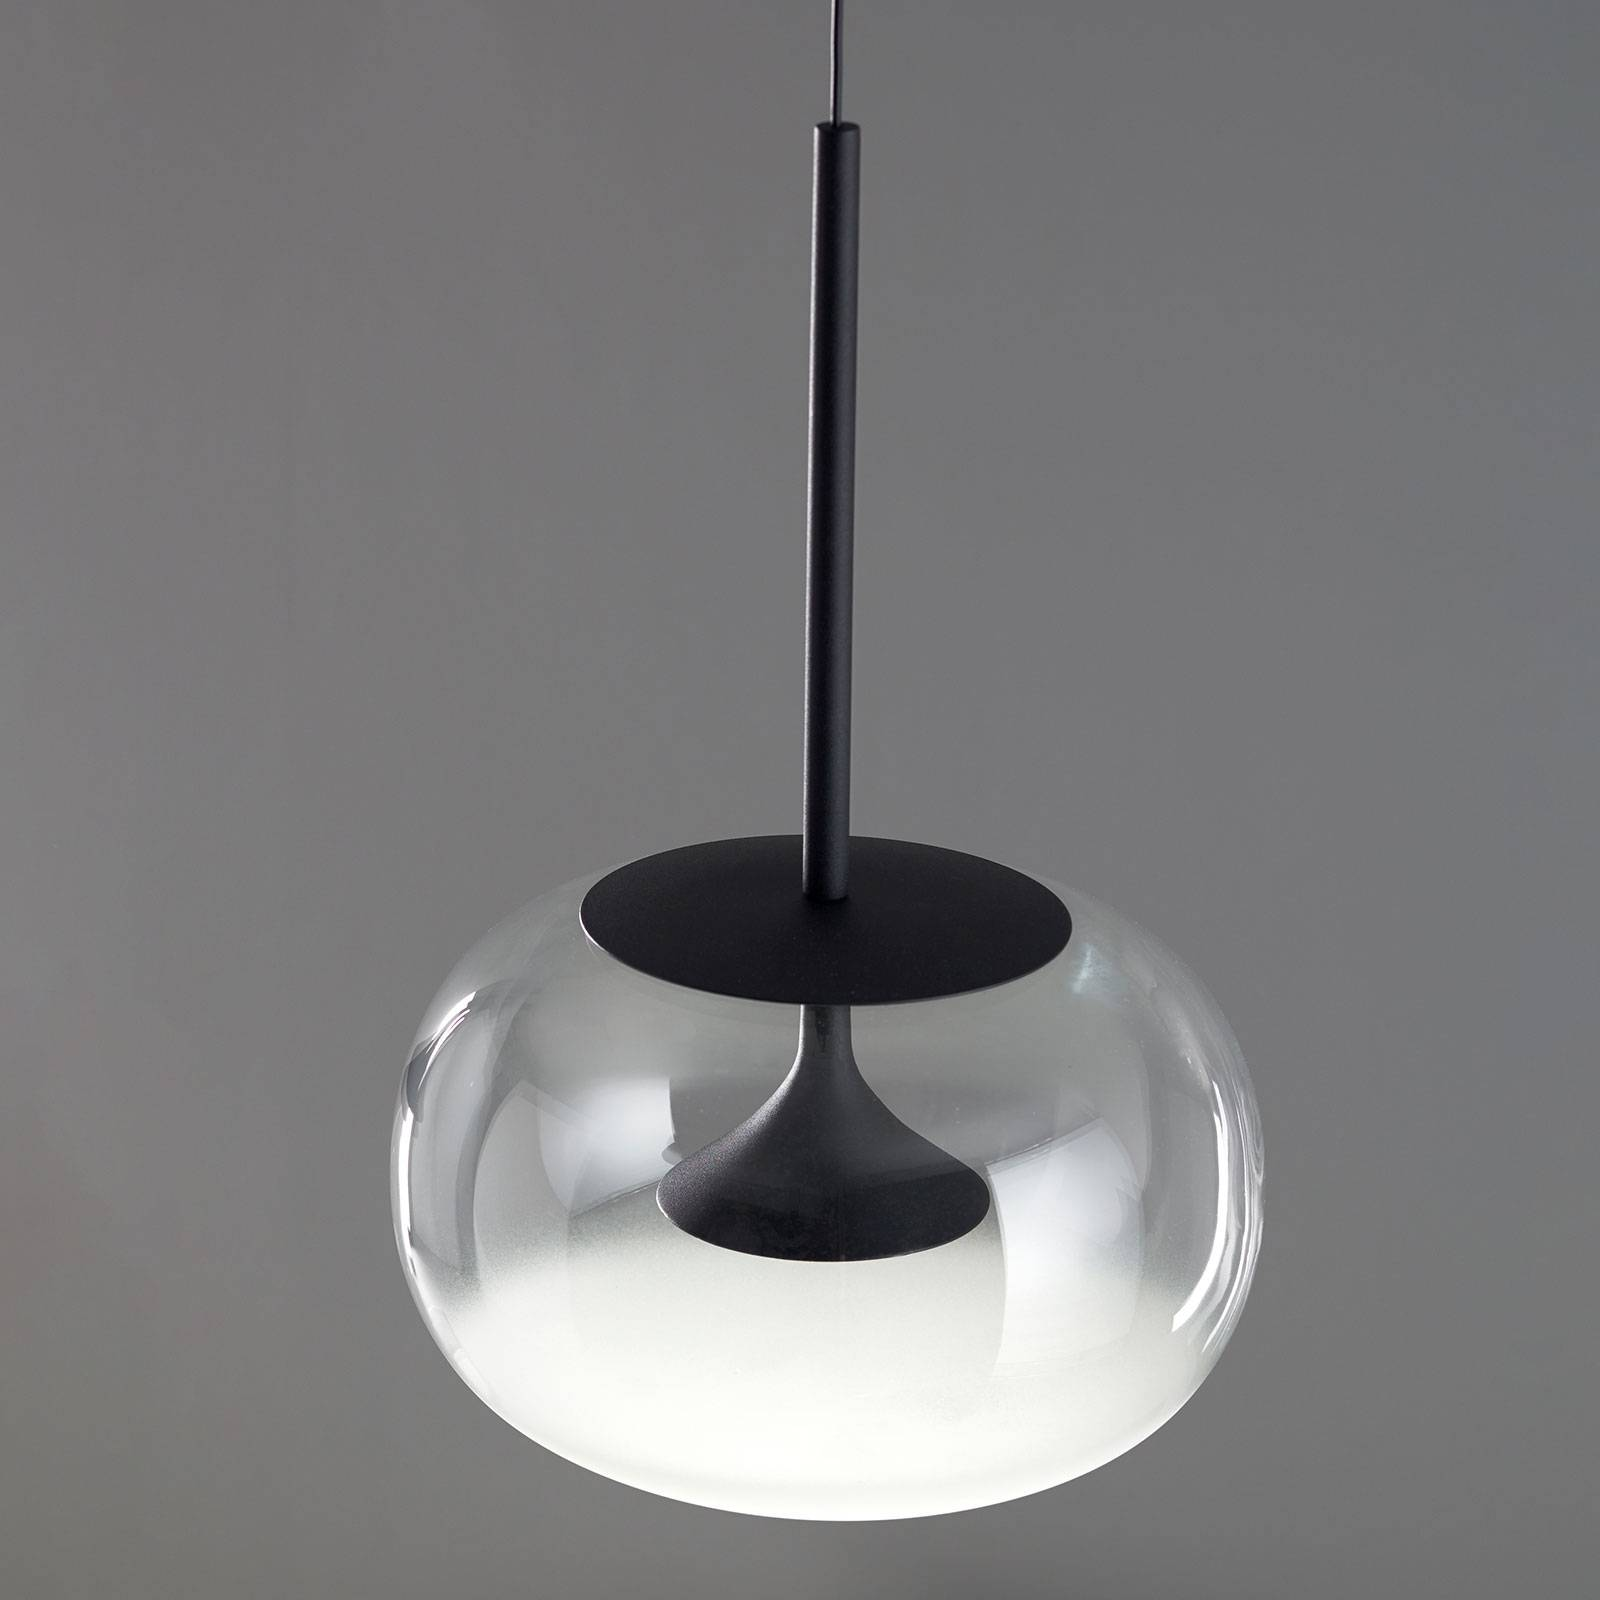 Grok Alive LED hanglamp 00-6671 dubbele kap